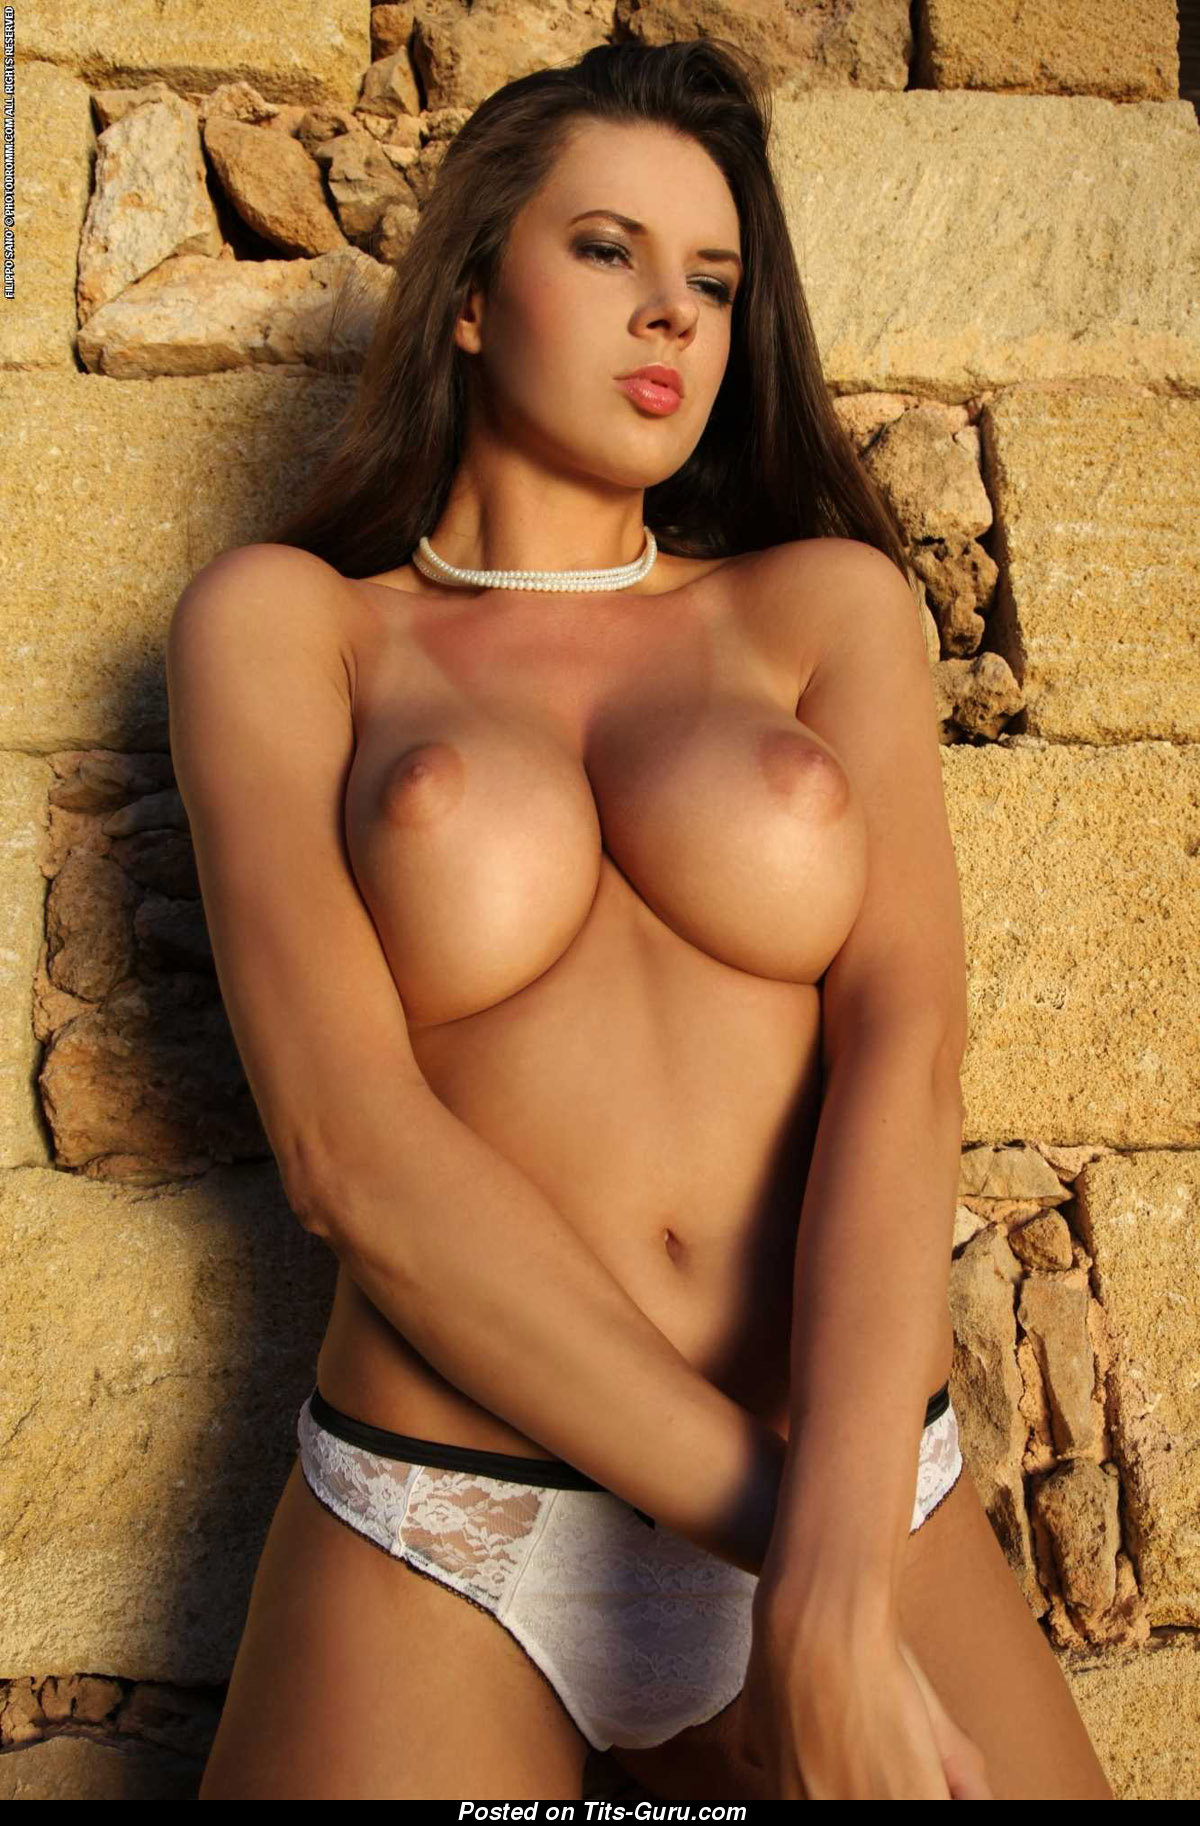 Winona - Naked Hot Lady With Big Tittys Photo  13042015 -8464